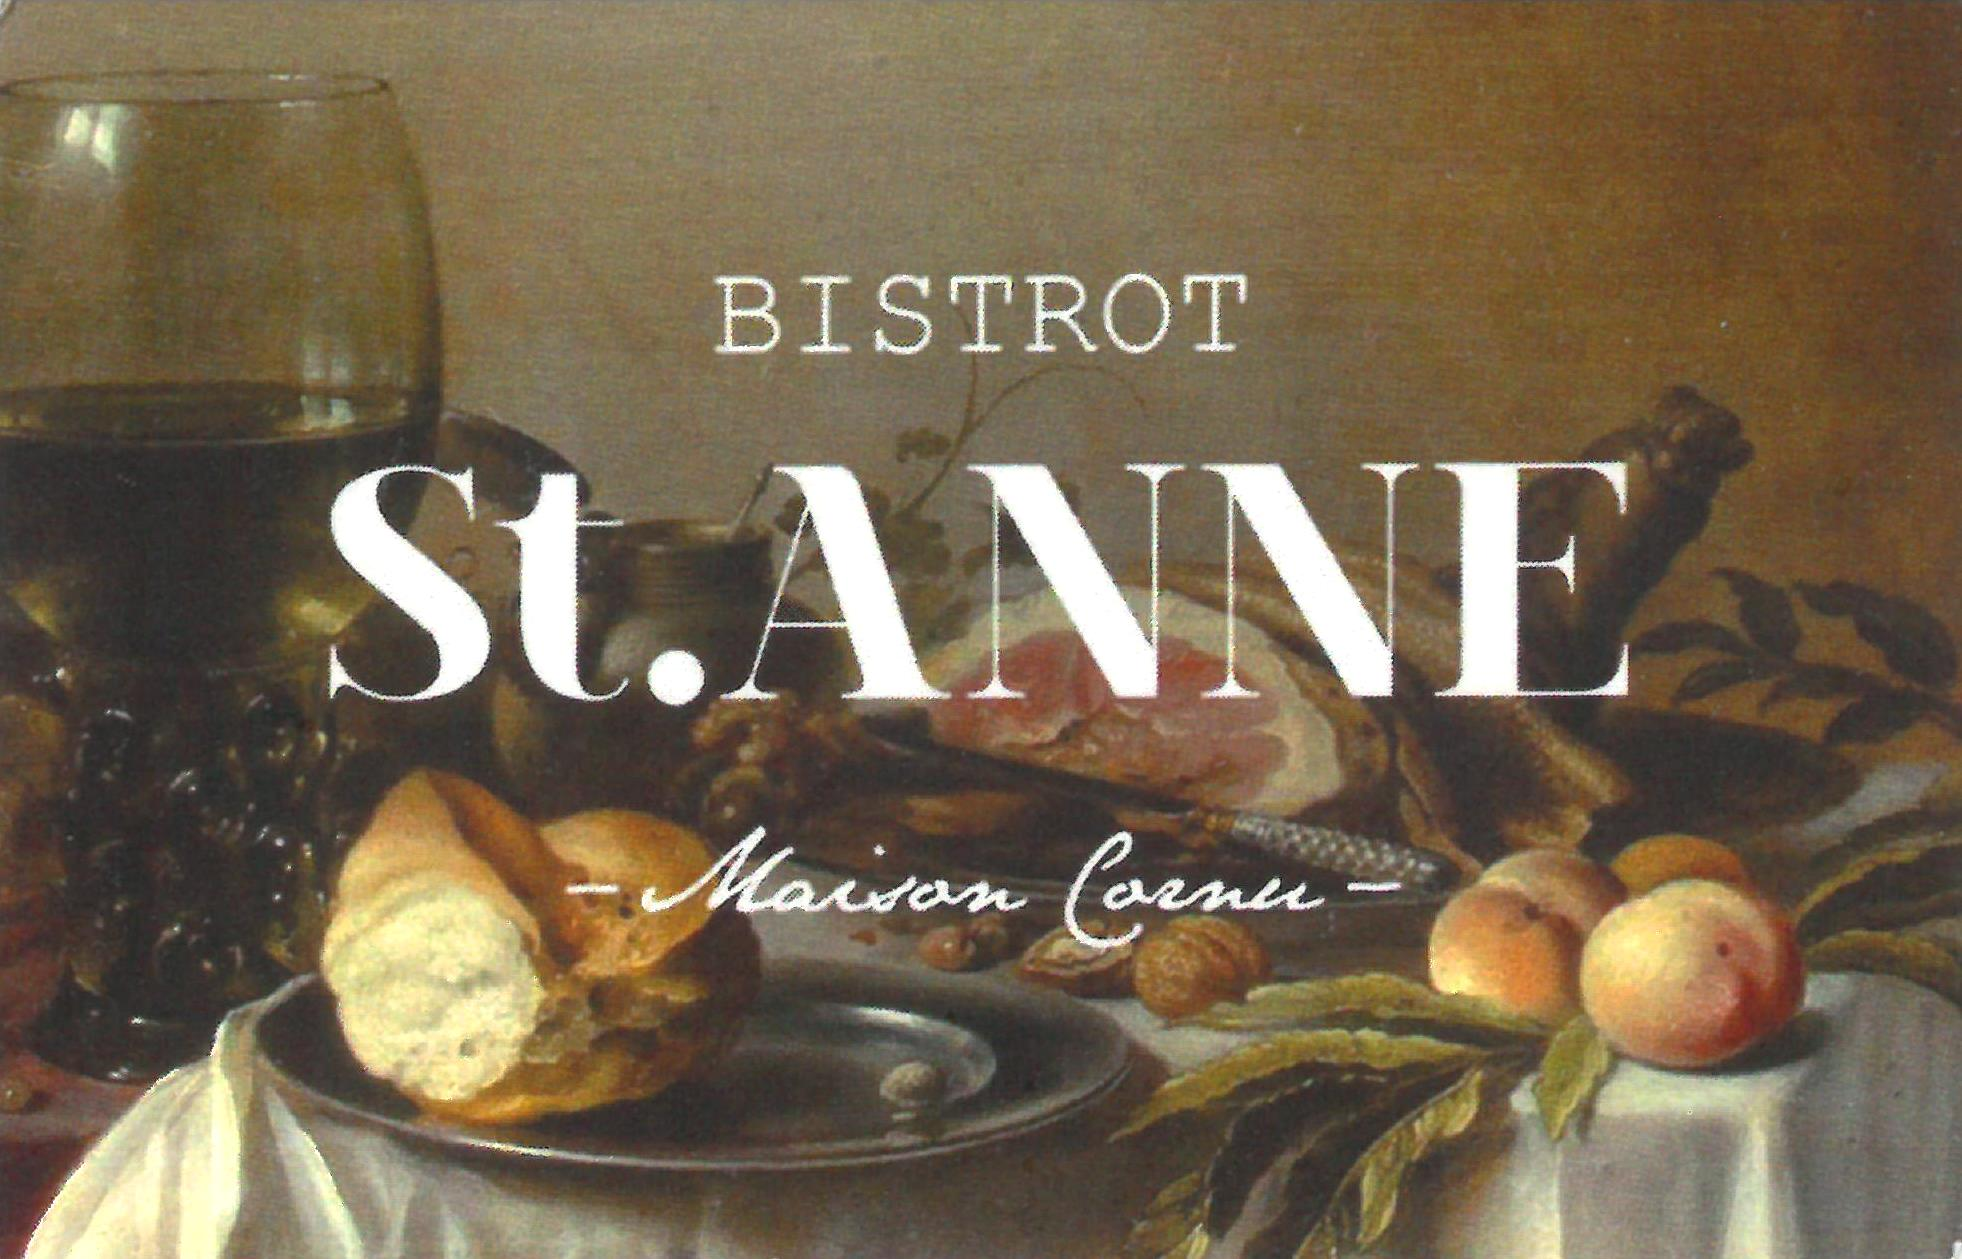 Café-restaurant Bistrot St Anne / Maison Cornu